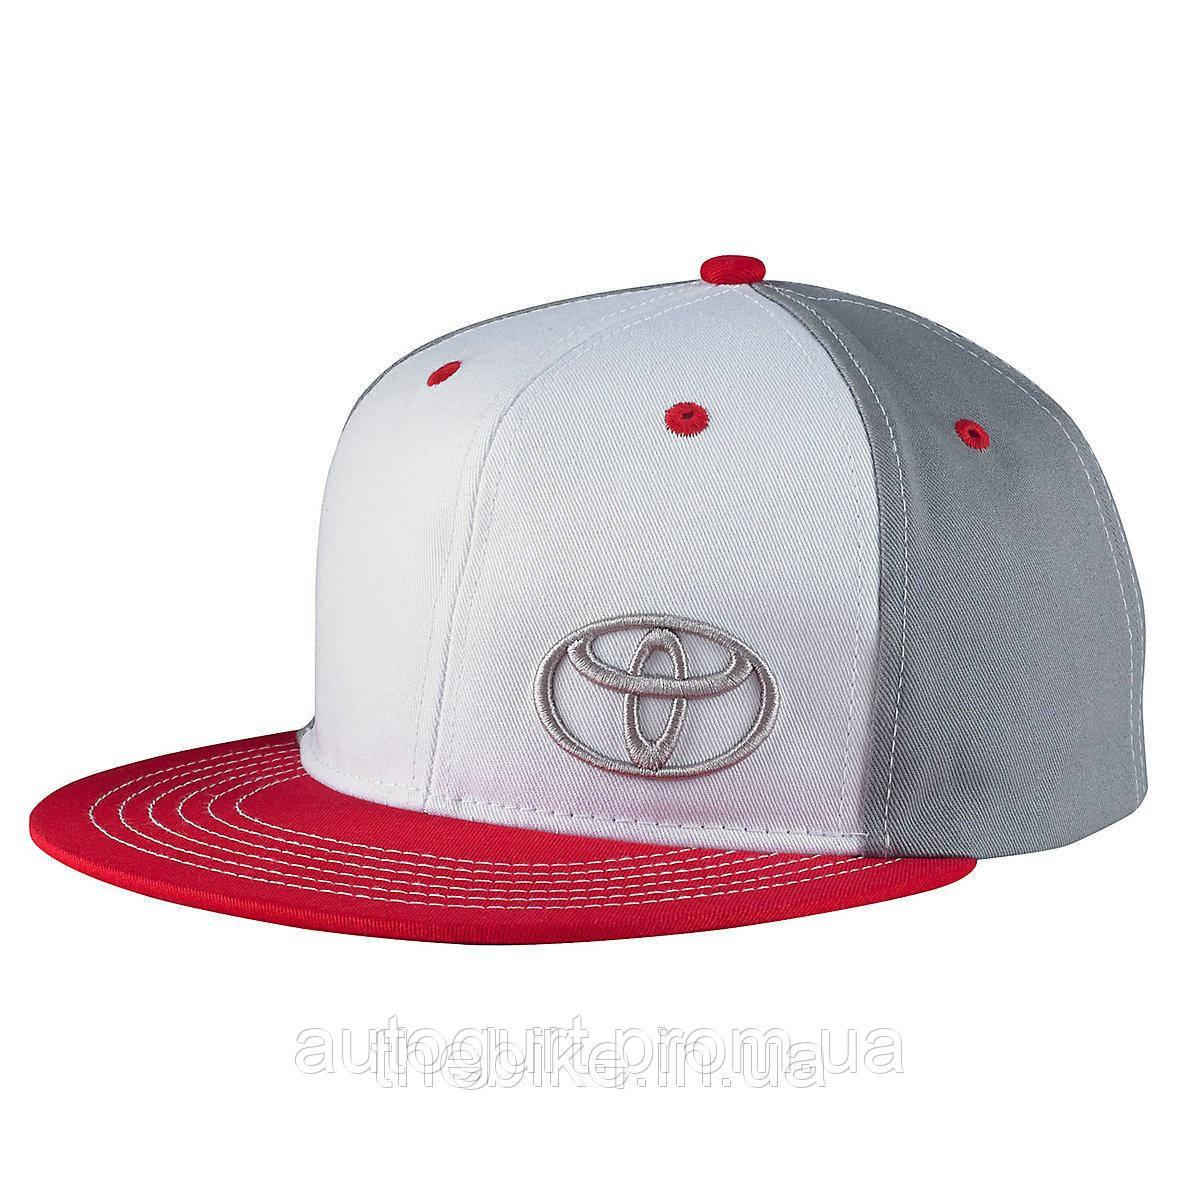 Бейсболка Toyota Princeton Flat Bill Cap